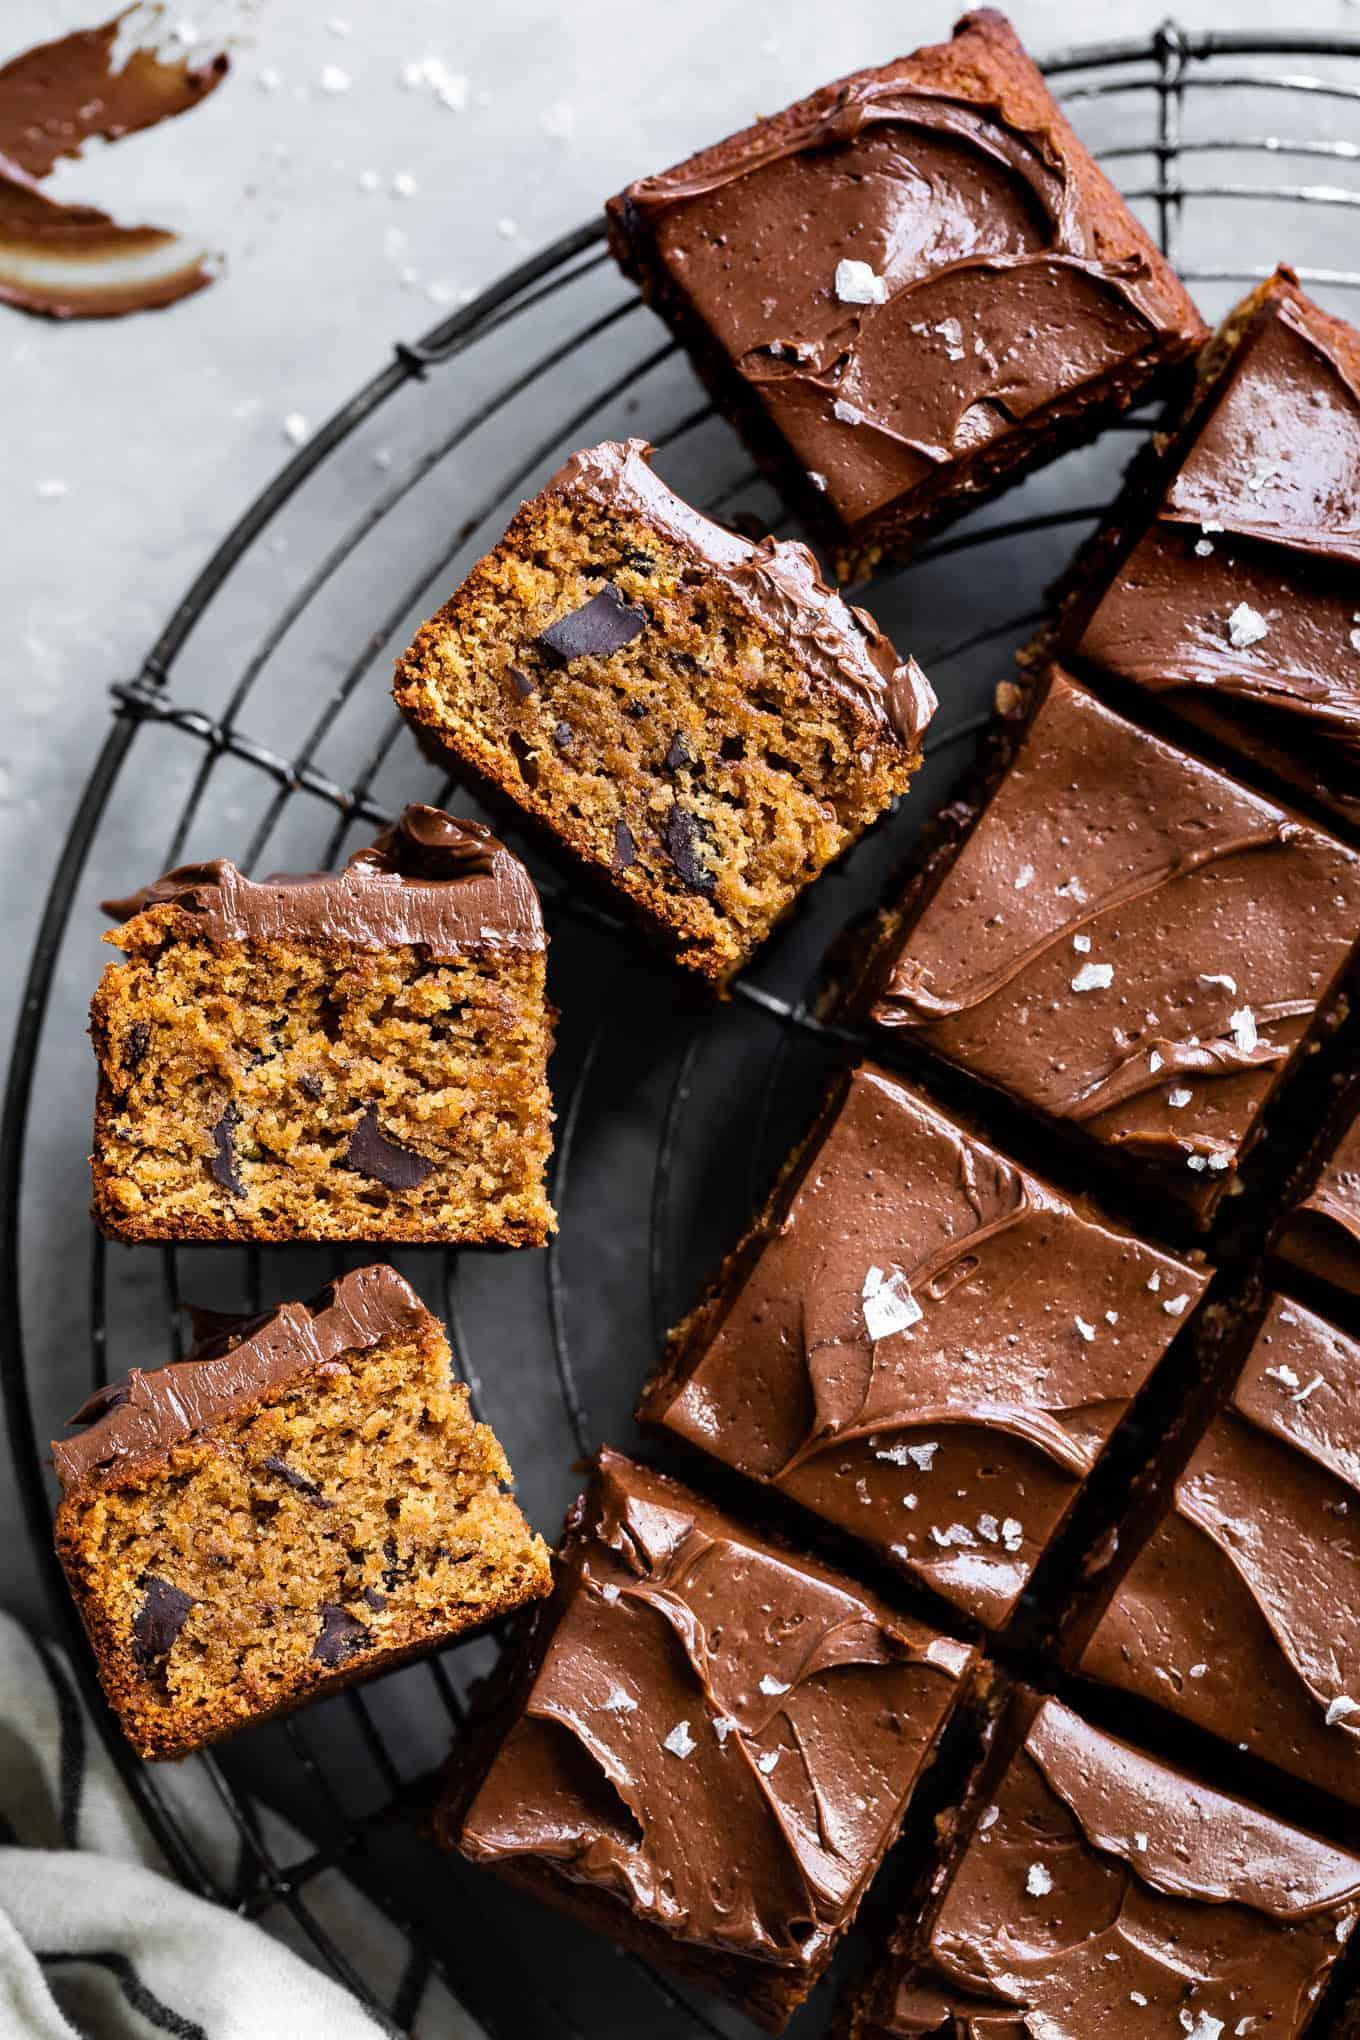 Gluten-Free Snack Tahini Coconut Flour Cake with Chocolate Buttercream